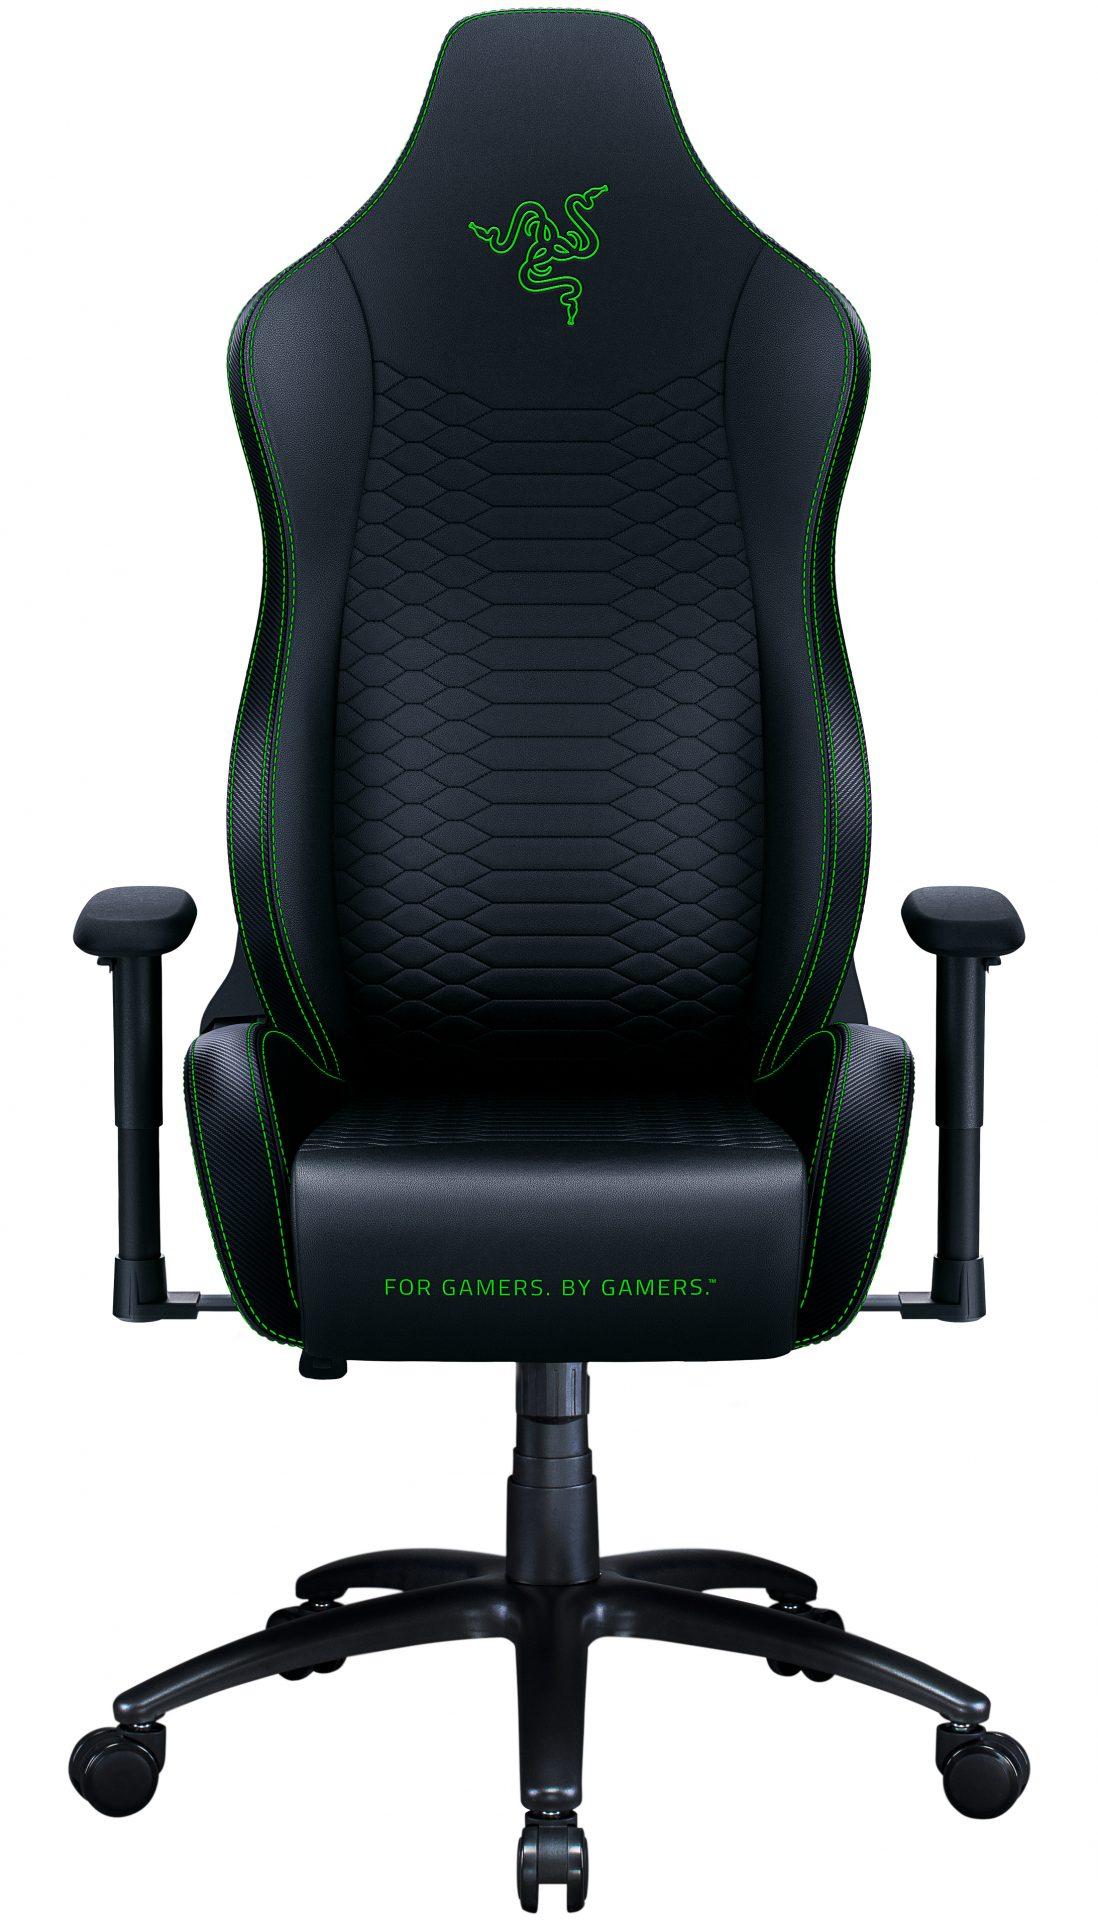 Razer ISKUR X Black/Green - Ergonomic Gaming Chair - Razer 1.28.80.02.011